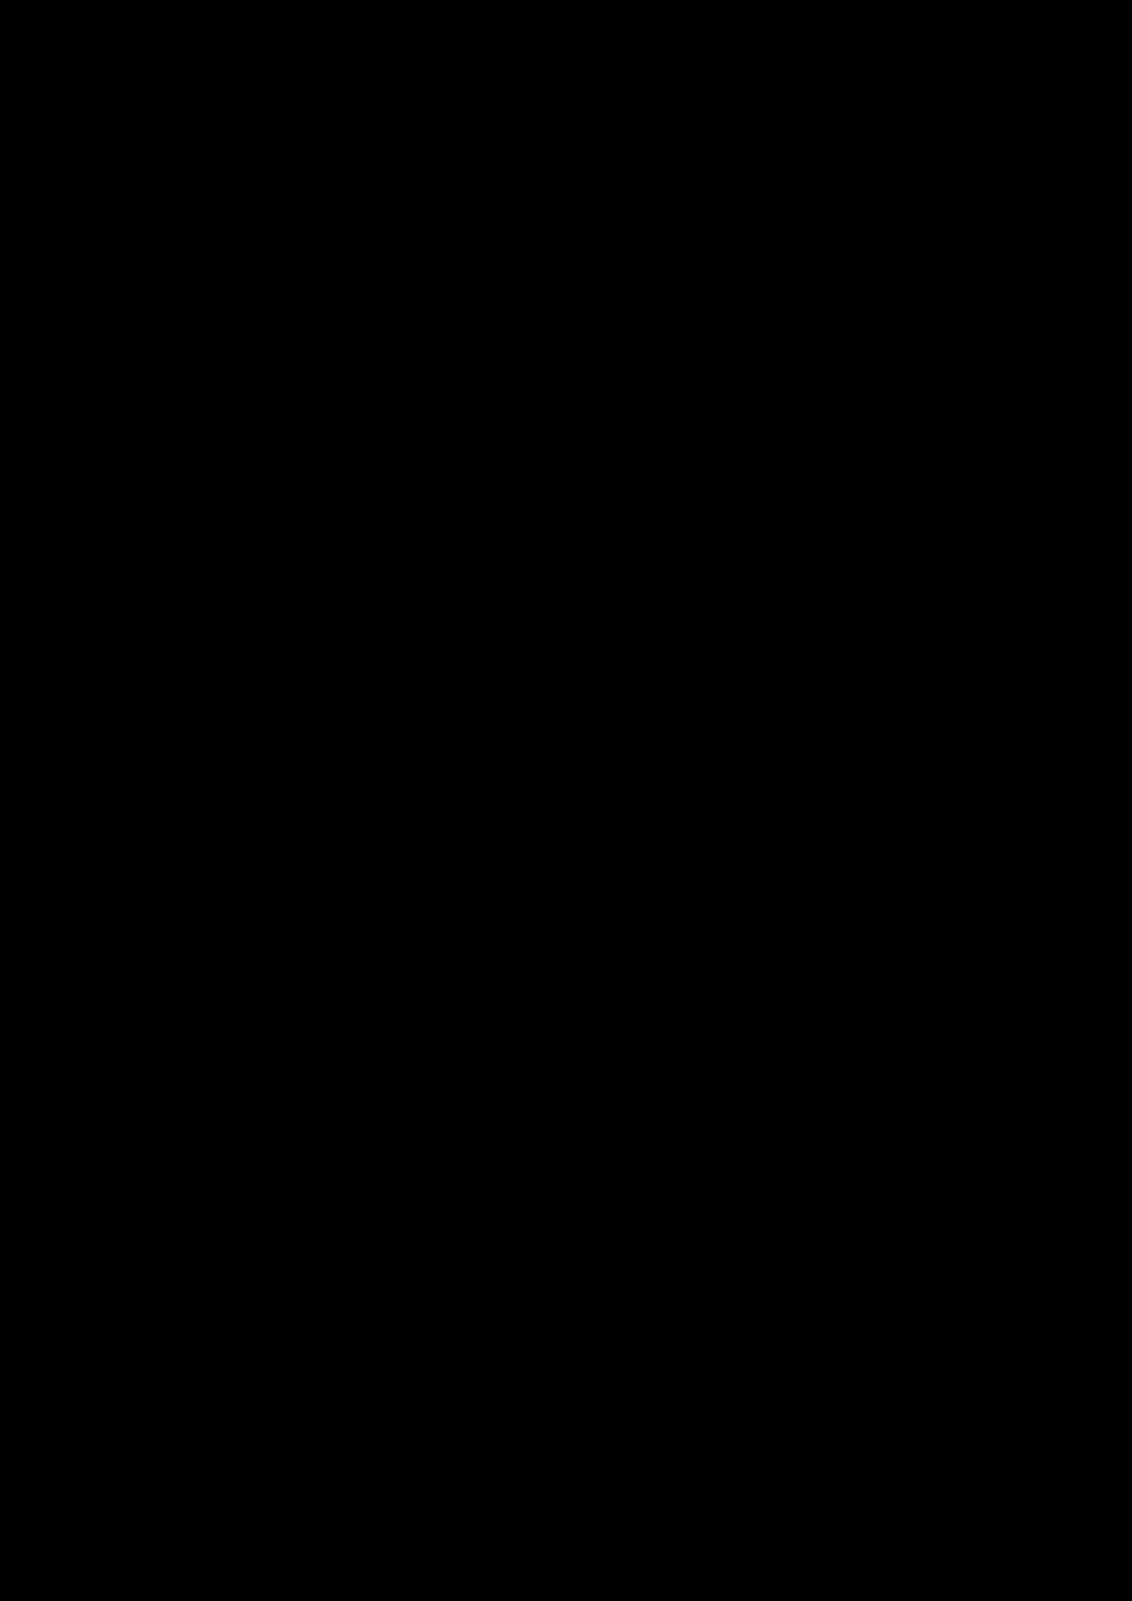 Prosti slide, Image 28